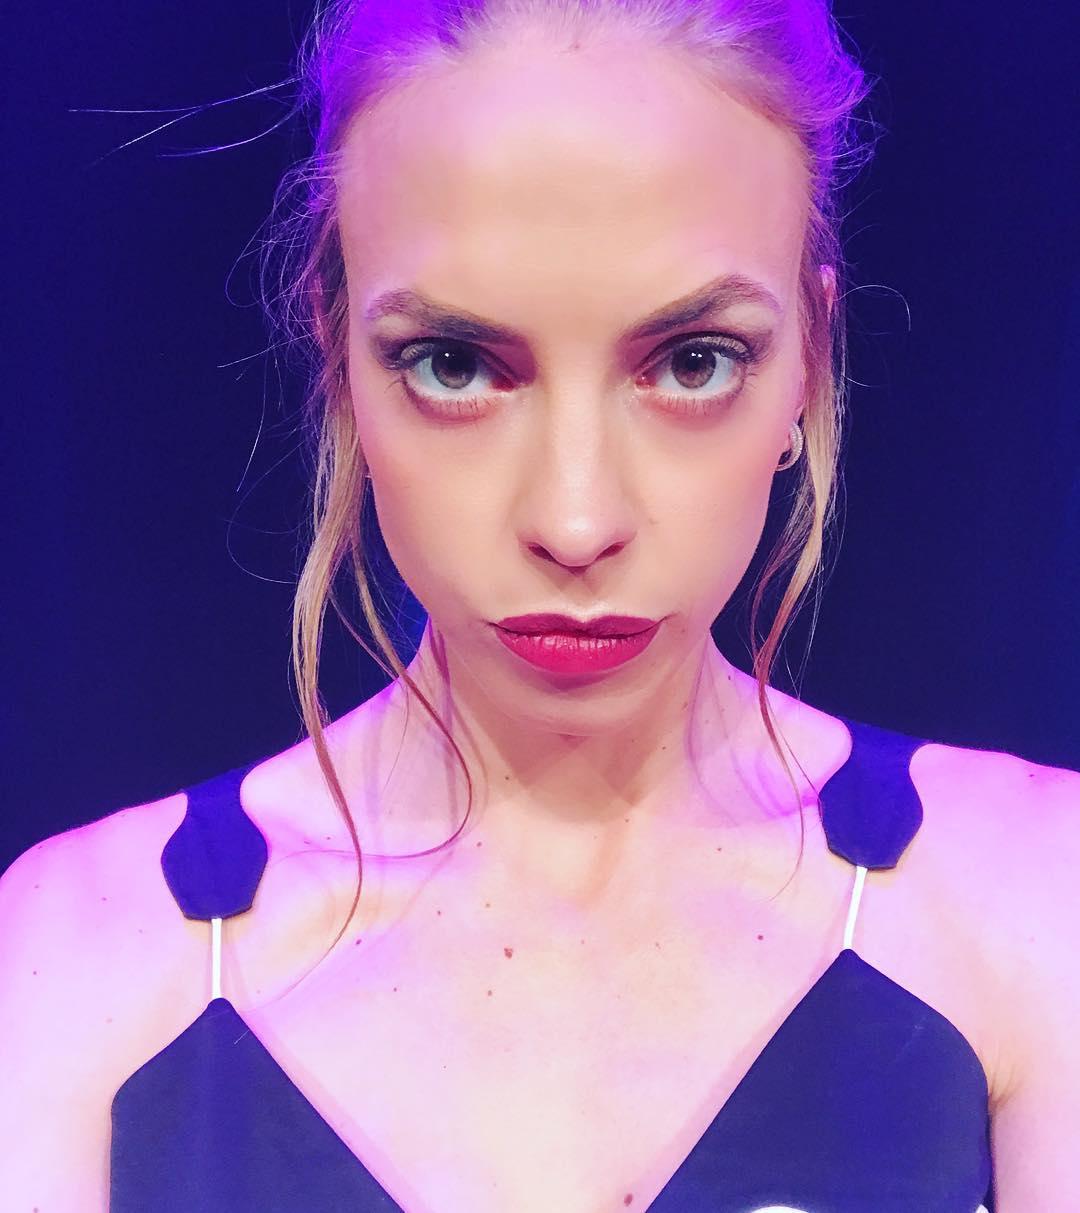 Надежда Сысоева: Селфи прямо со сцены #comedywoman #хайфа #сценаселфи